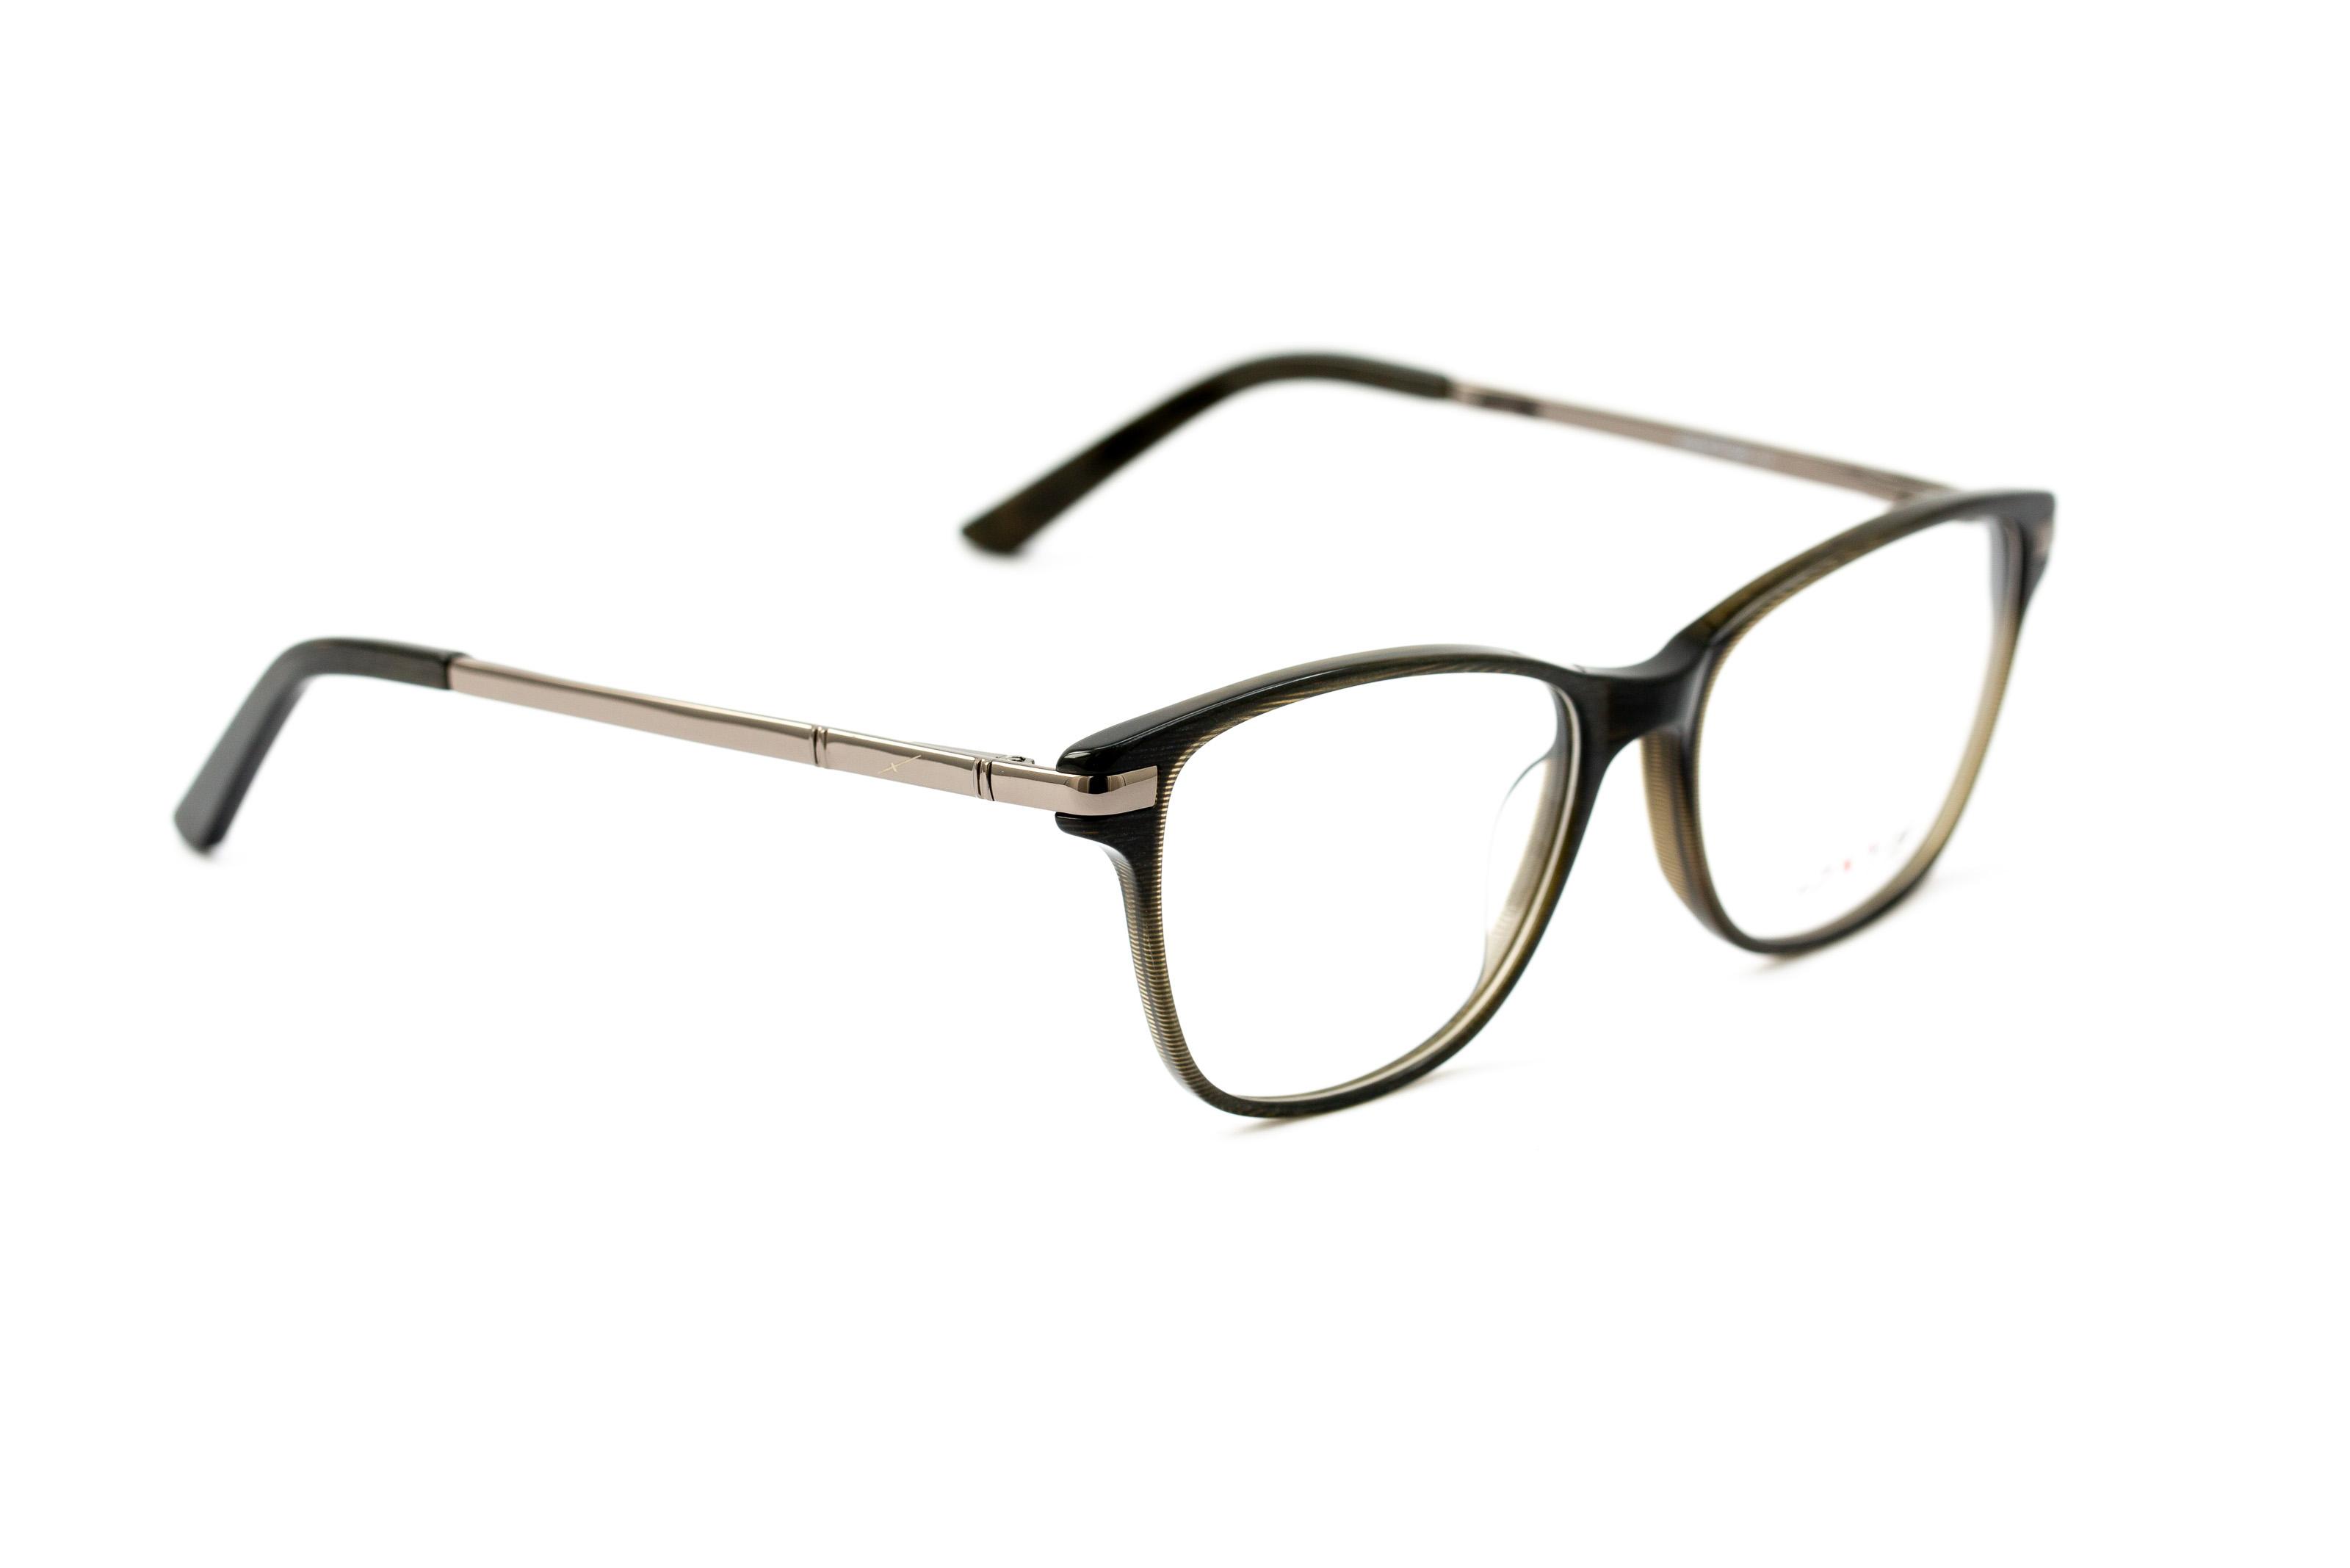 Rama de ochelari Oxys VX2009C1